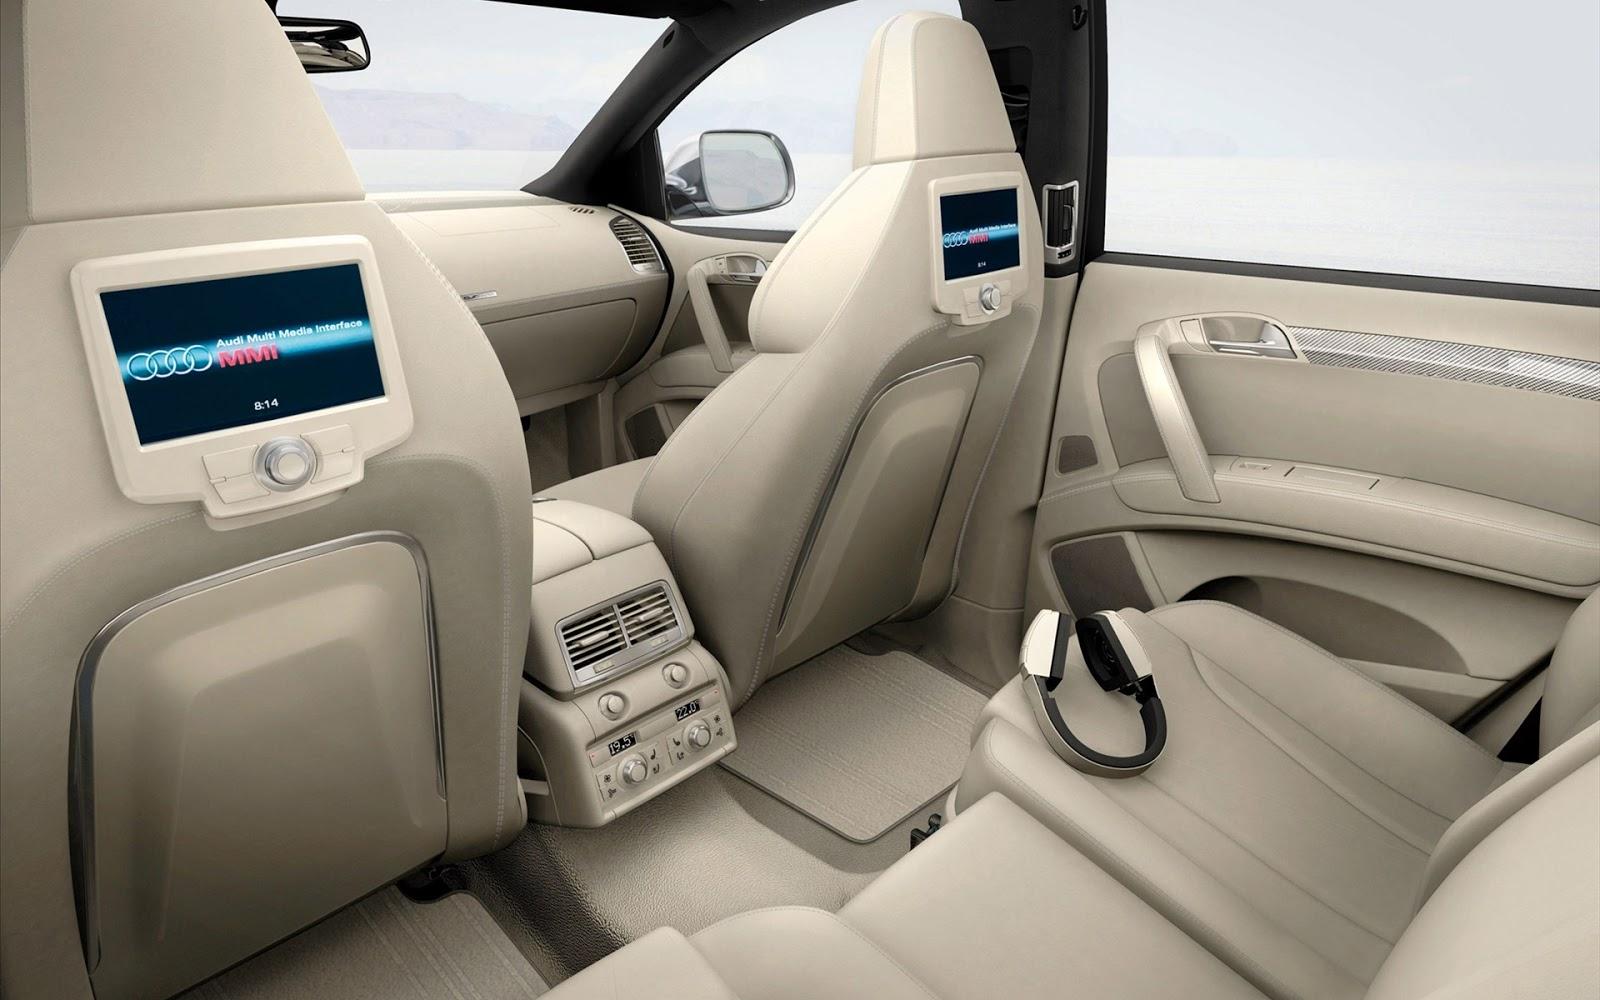 http://1.bp.blogspot.com/-vgUDPzMXmvk/UPpqbvtdoUI/AAAAAAAADaE/qmCjwJo0pis/s1600/audi-q7-v12-very-cool-interior.jpg